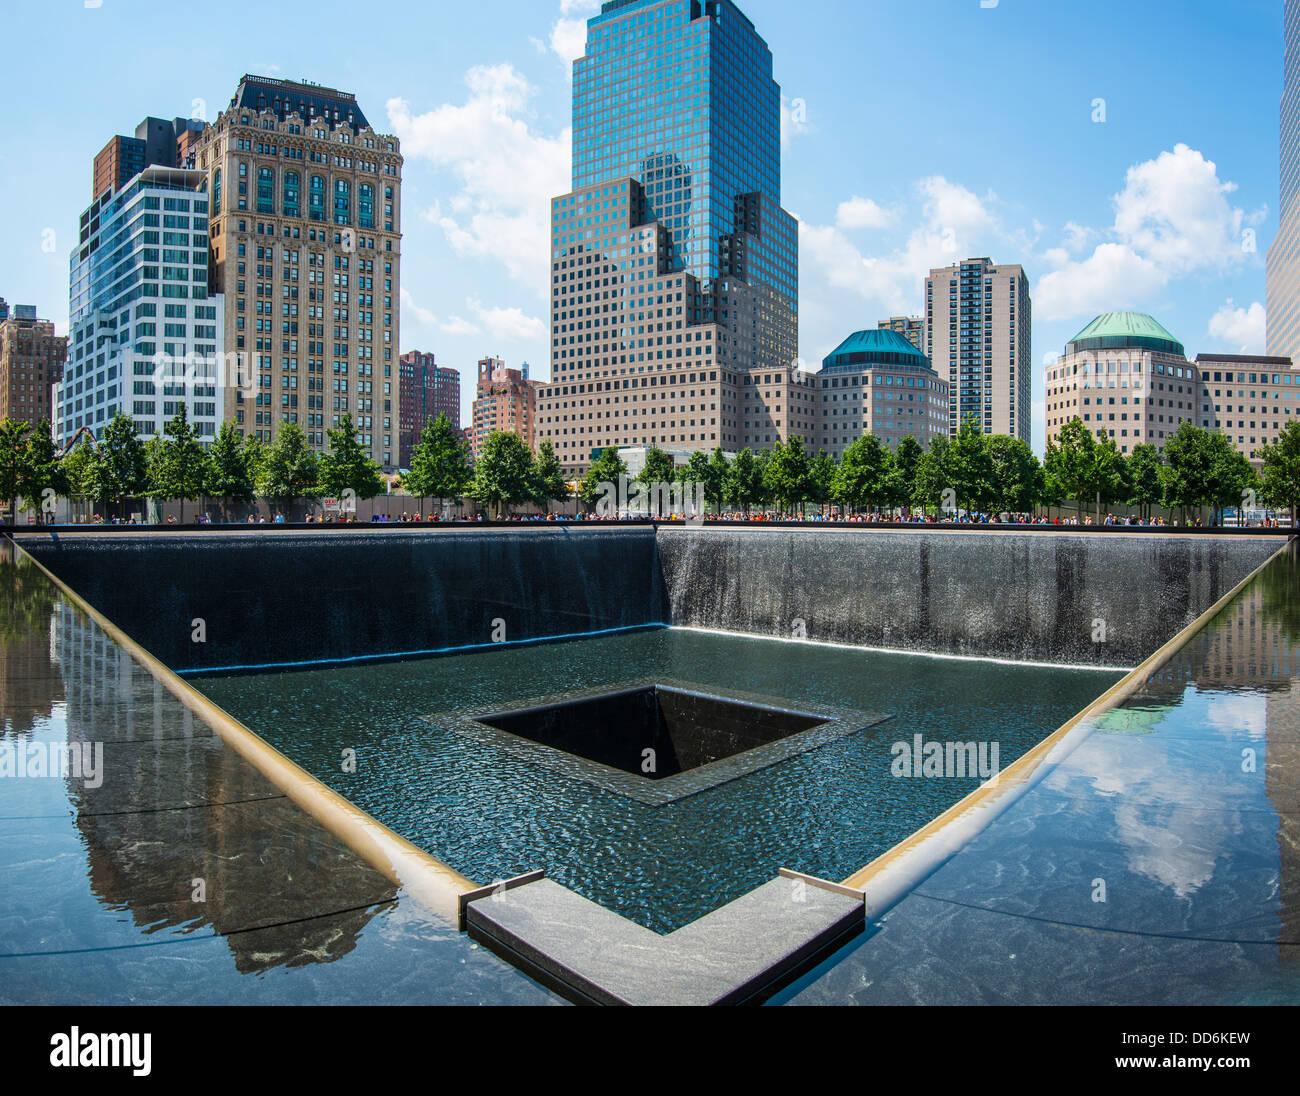 September 11th Memorial in New York City. - Stock Image